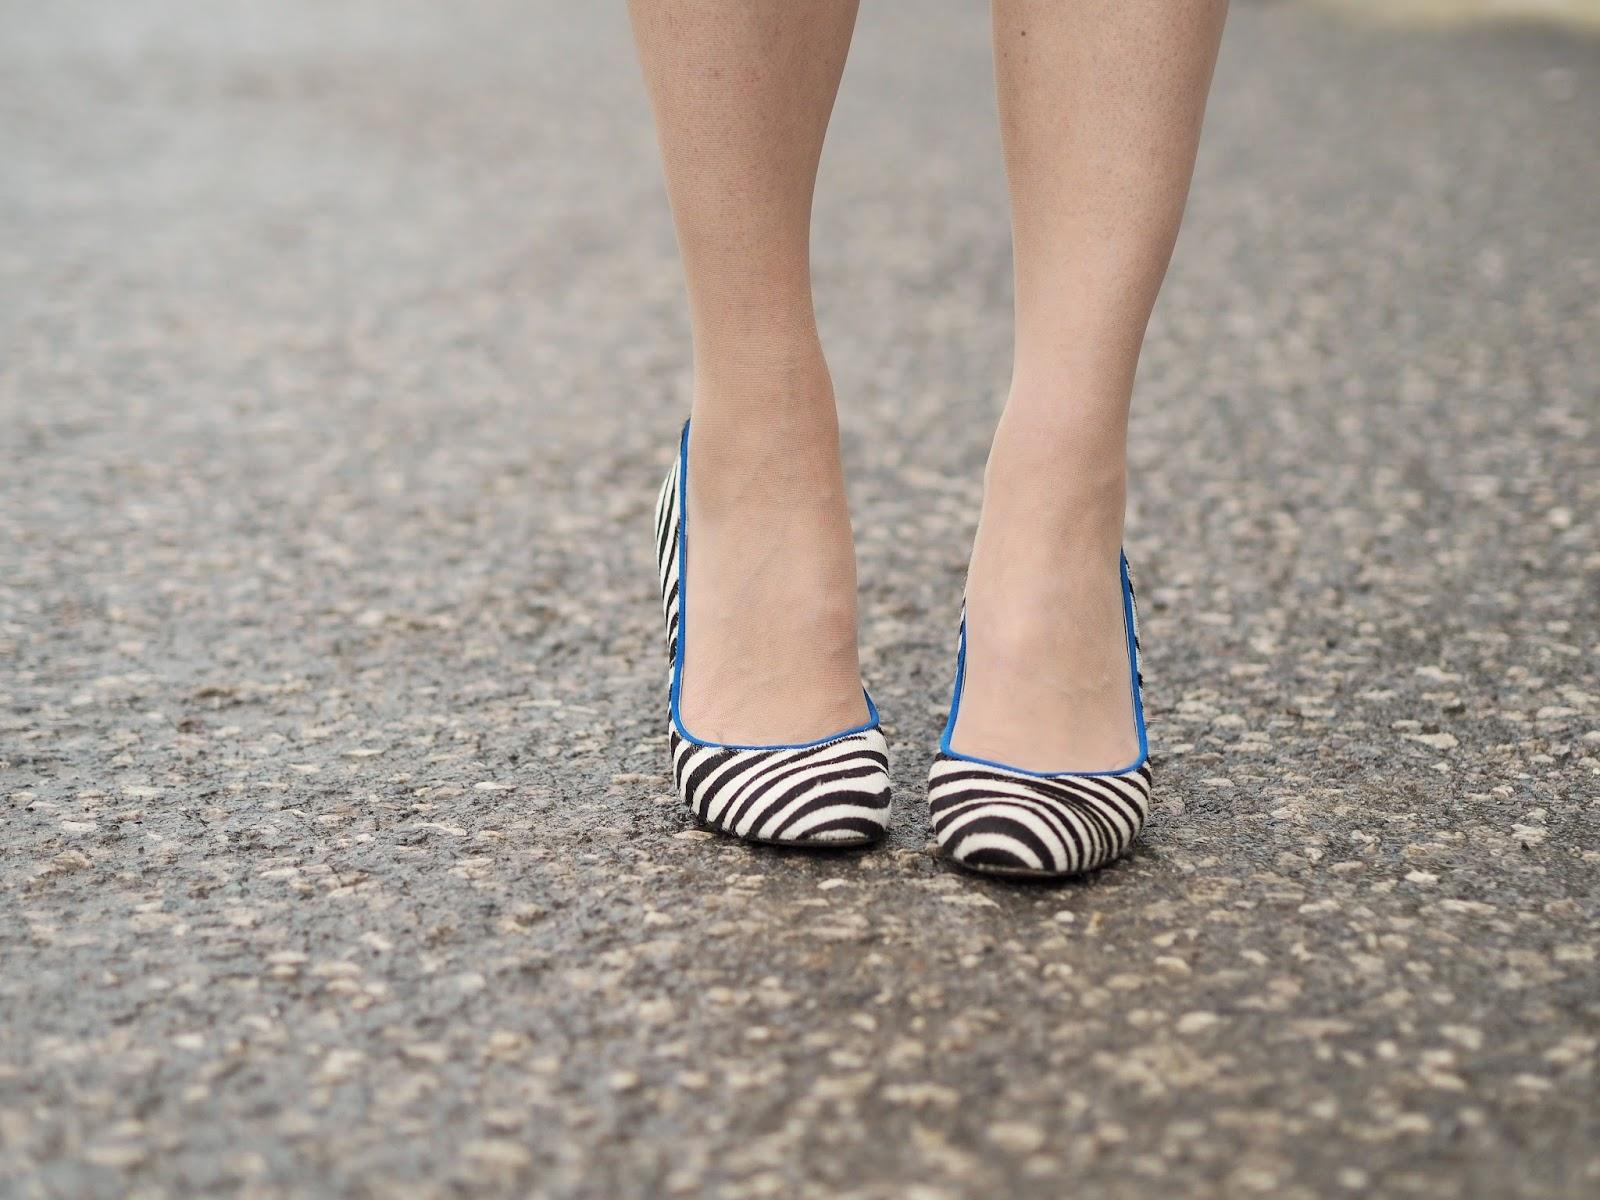 Zebra print shoes with cobalt blue heel and trim